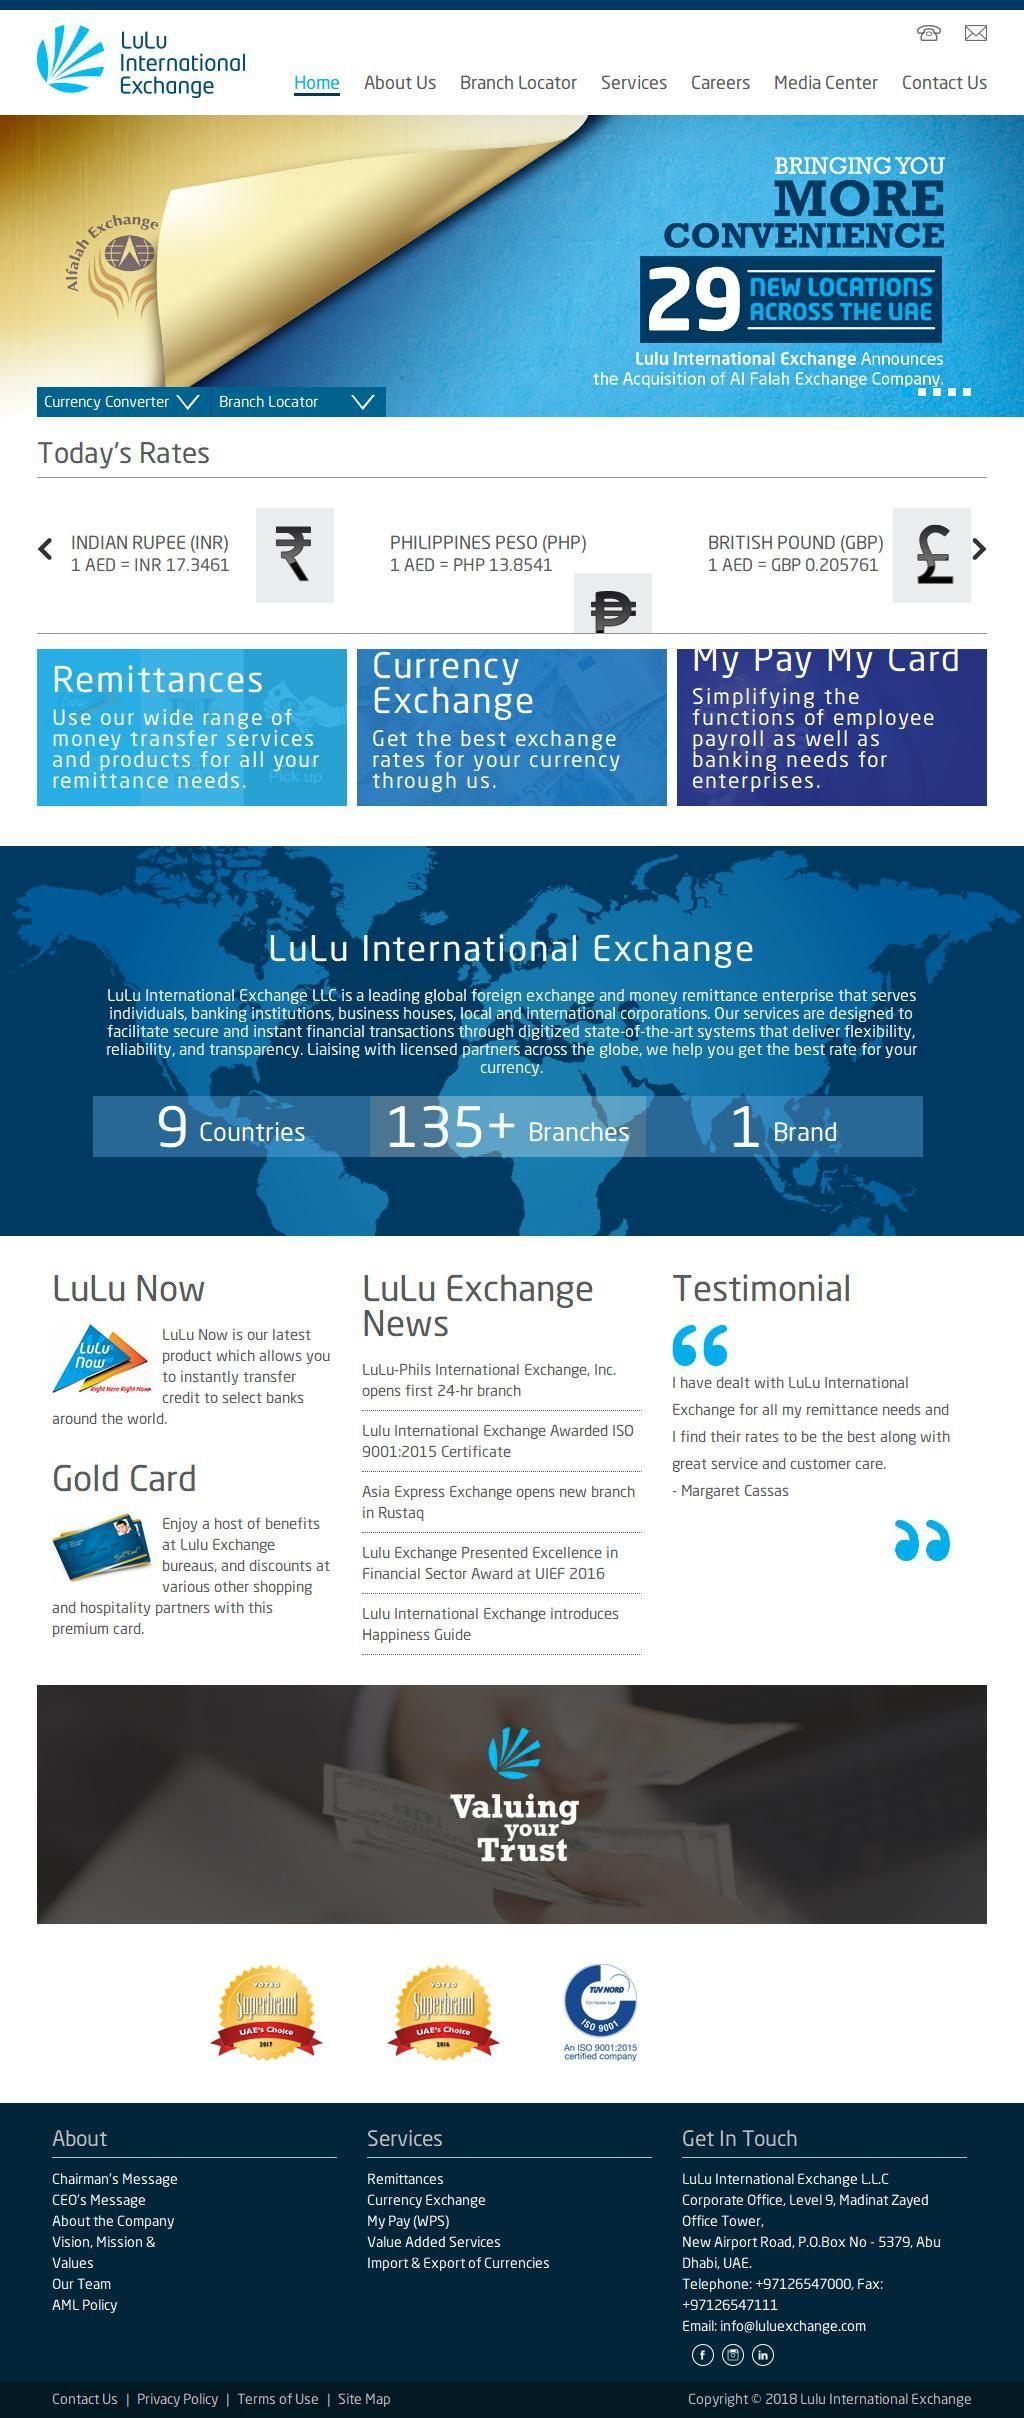 Lulu International Exchange Center Jebel Ali Mall, 57, 23a